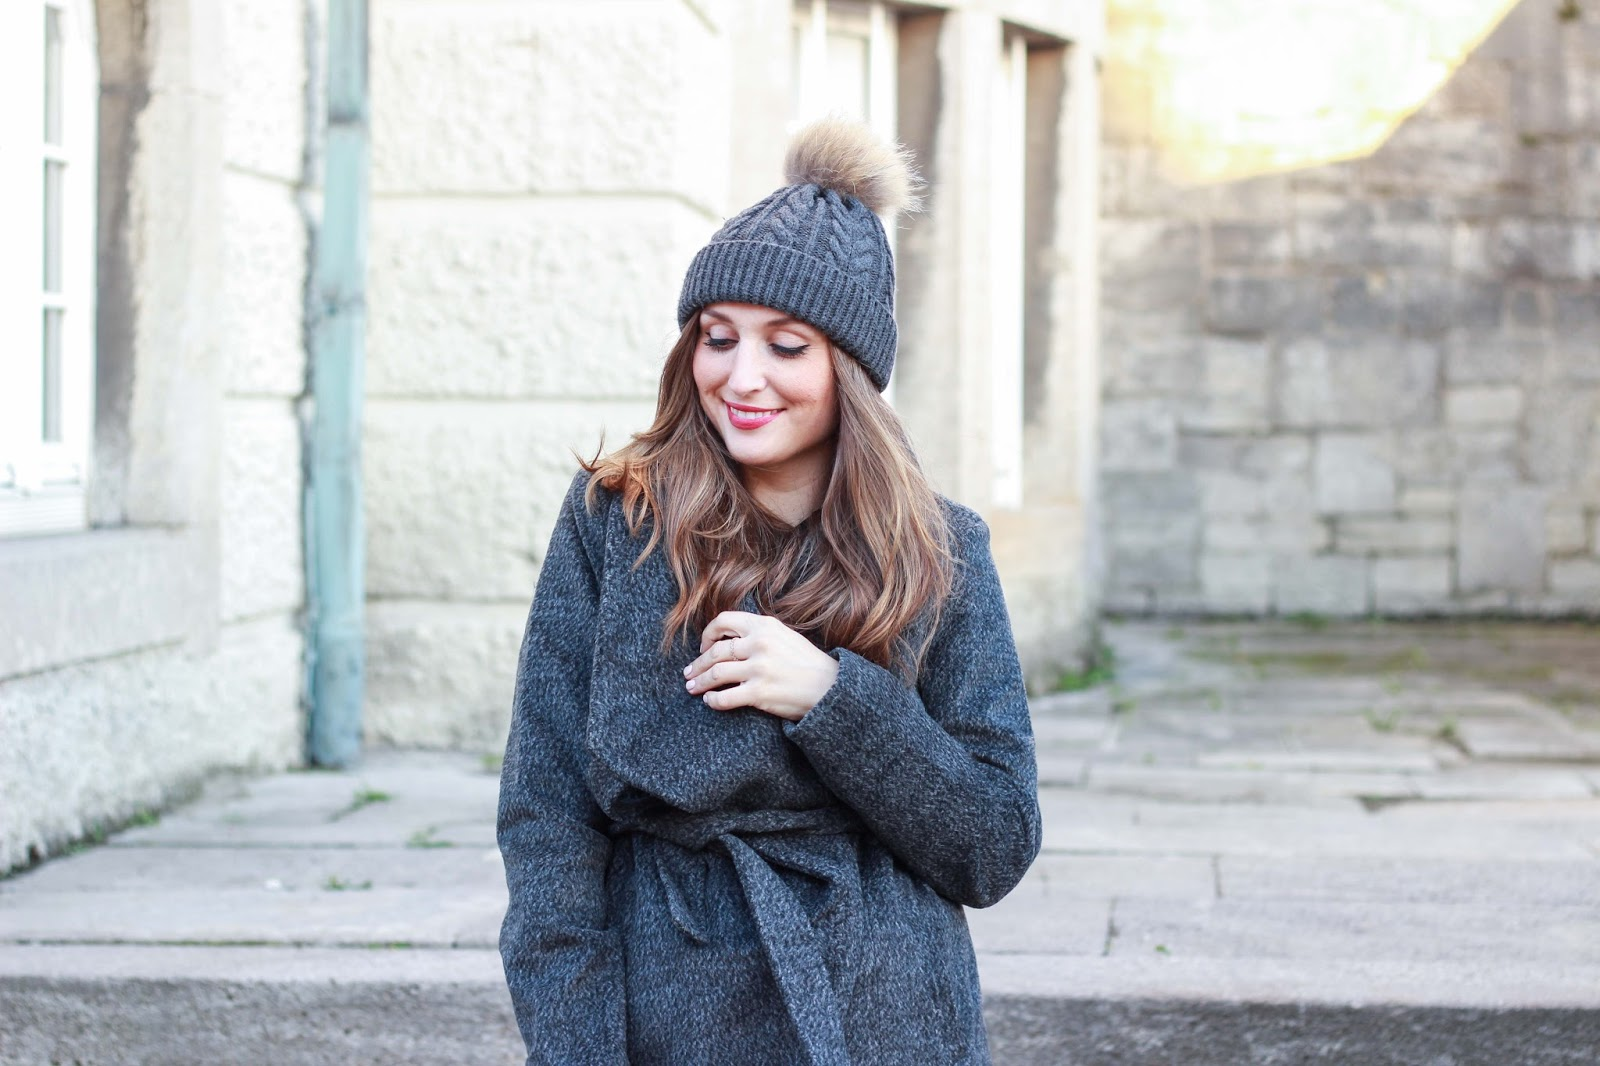 Graue Jacke kombinieren - Fashionblogger aus Deutschland - jessica Buurman - Overknees - graue Overknees - Fashionstylebyjohanna - German